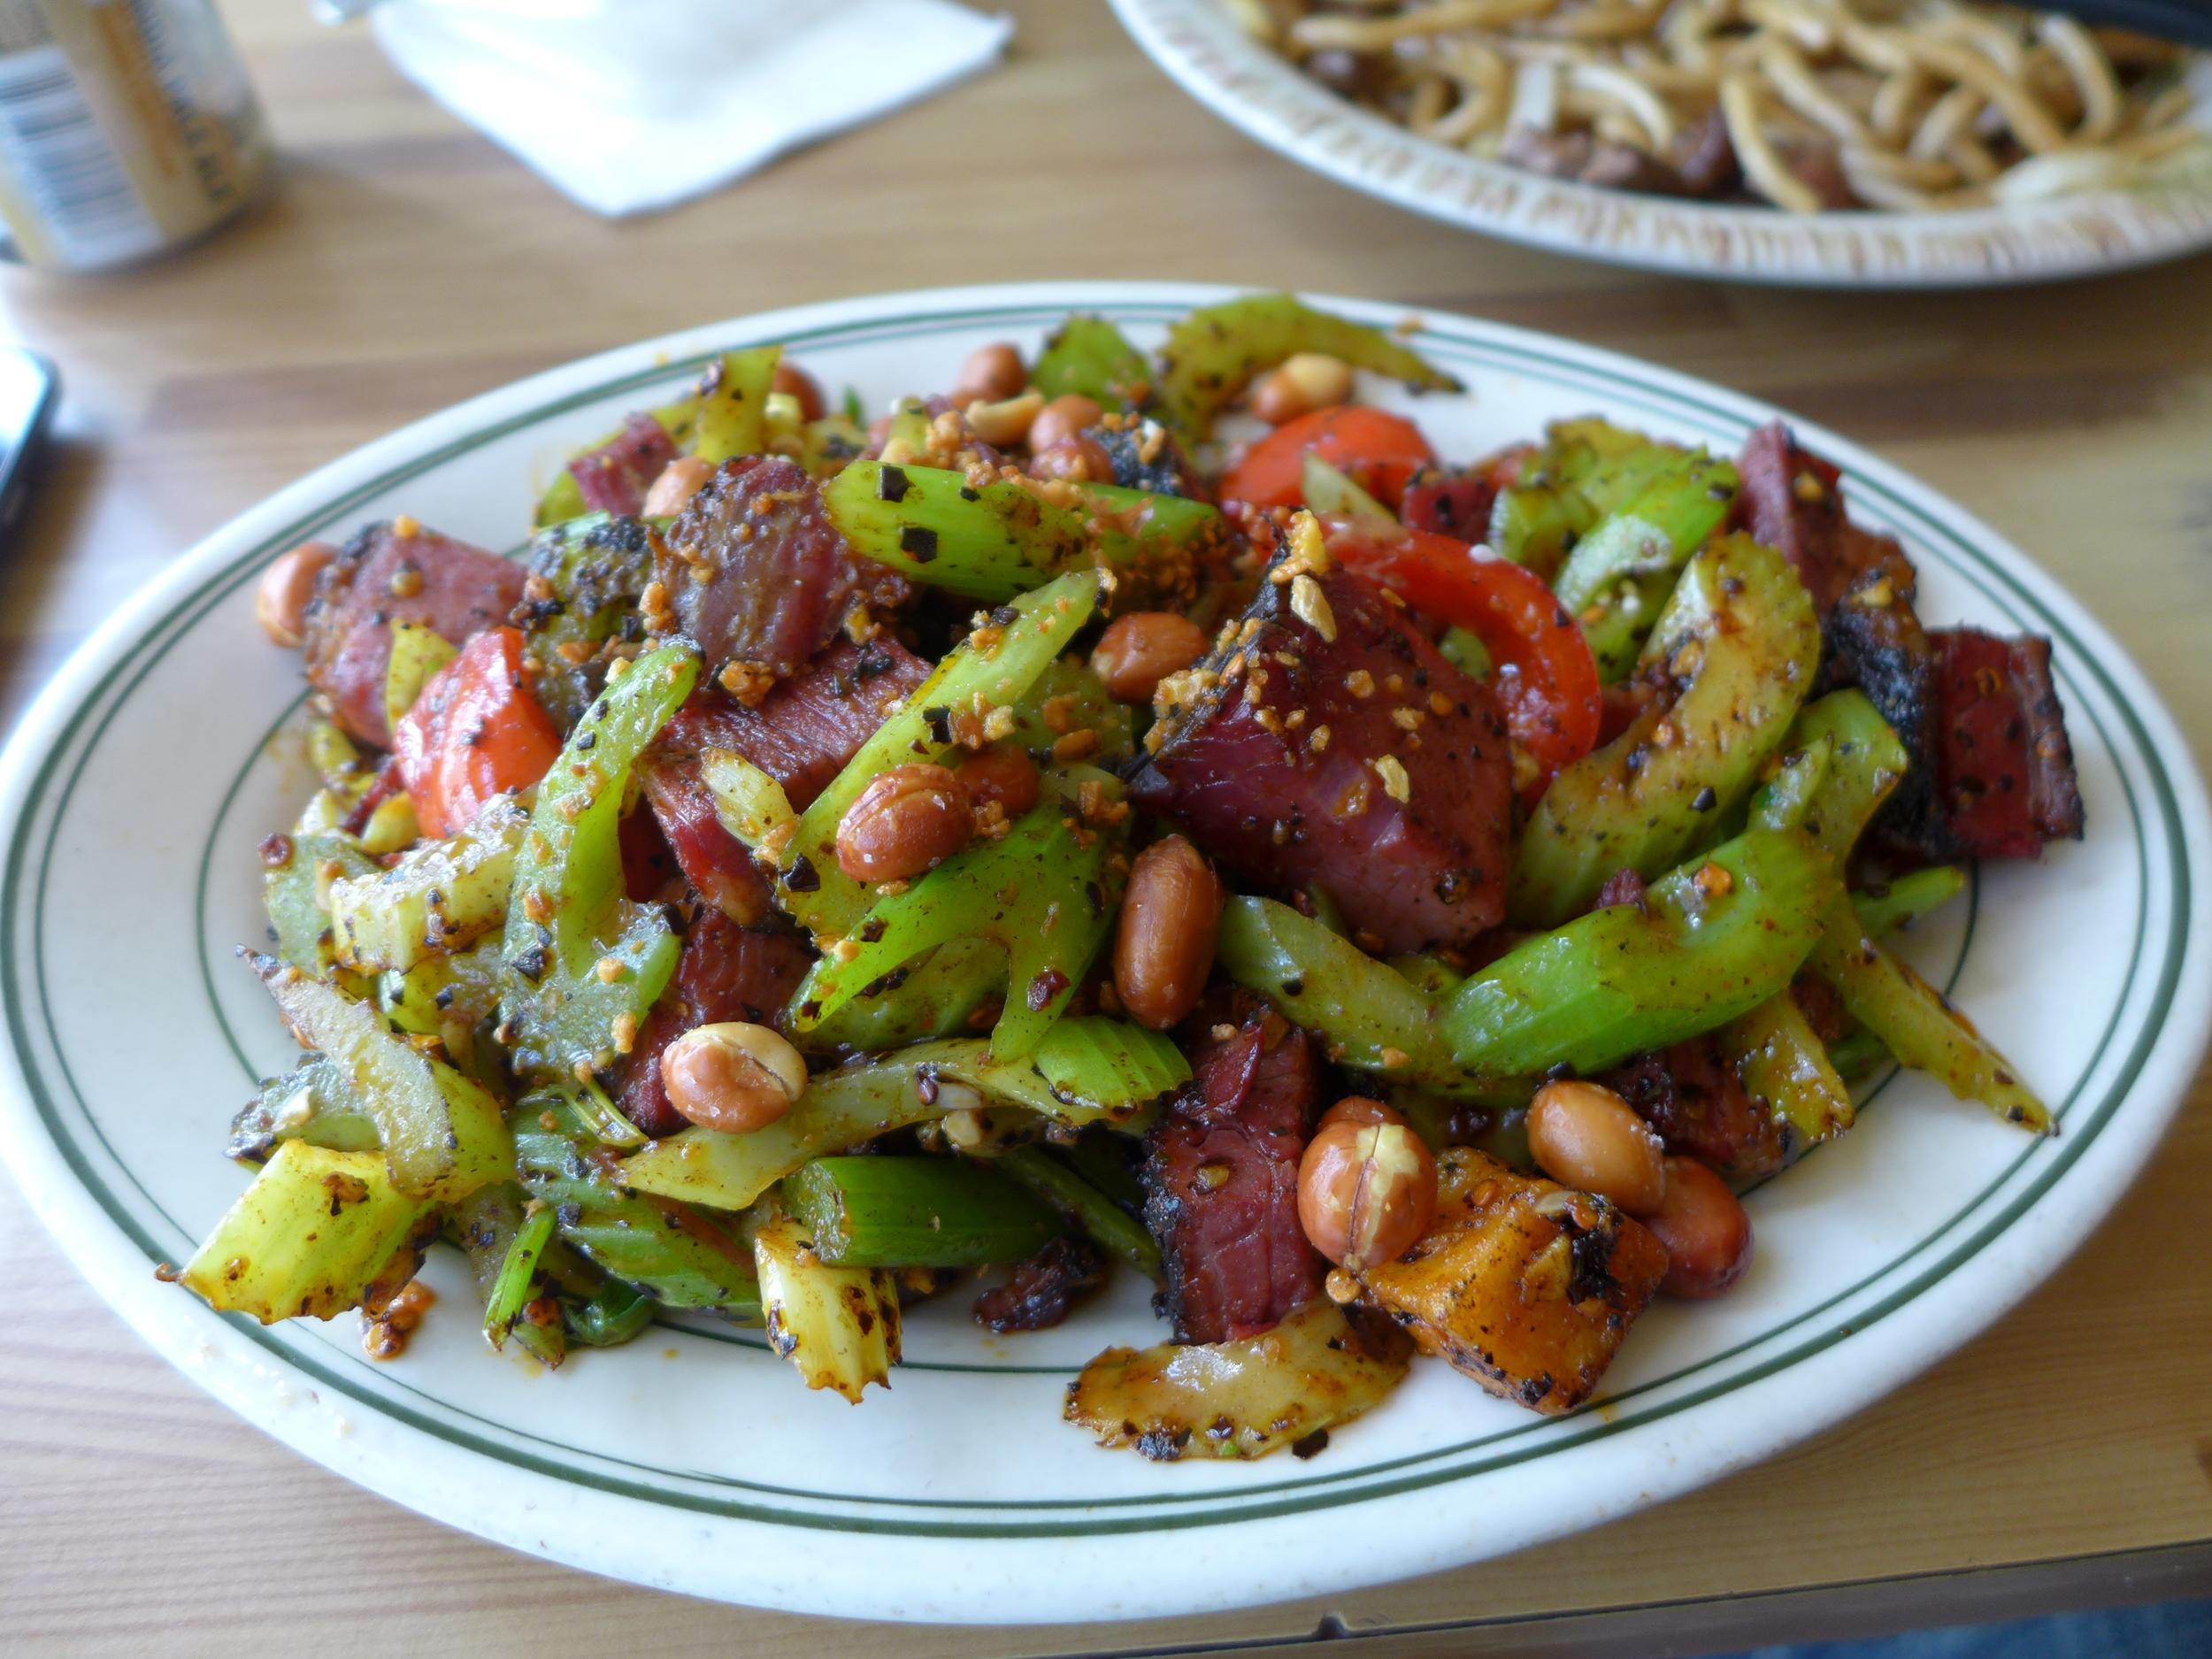 Kung Pao Pastrami with explosive chili, celery, potato, roasted peanut